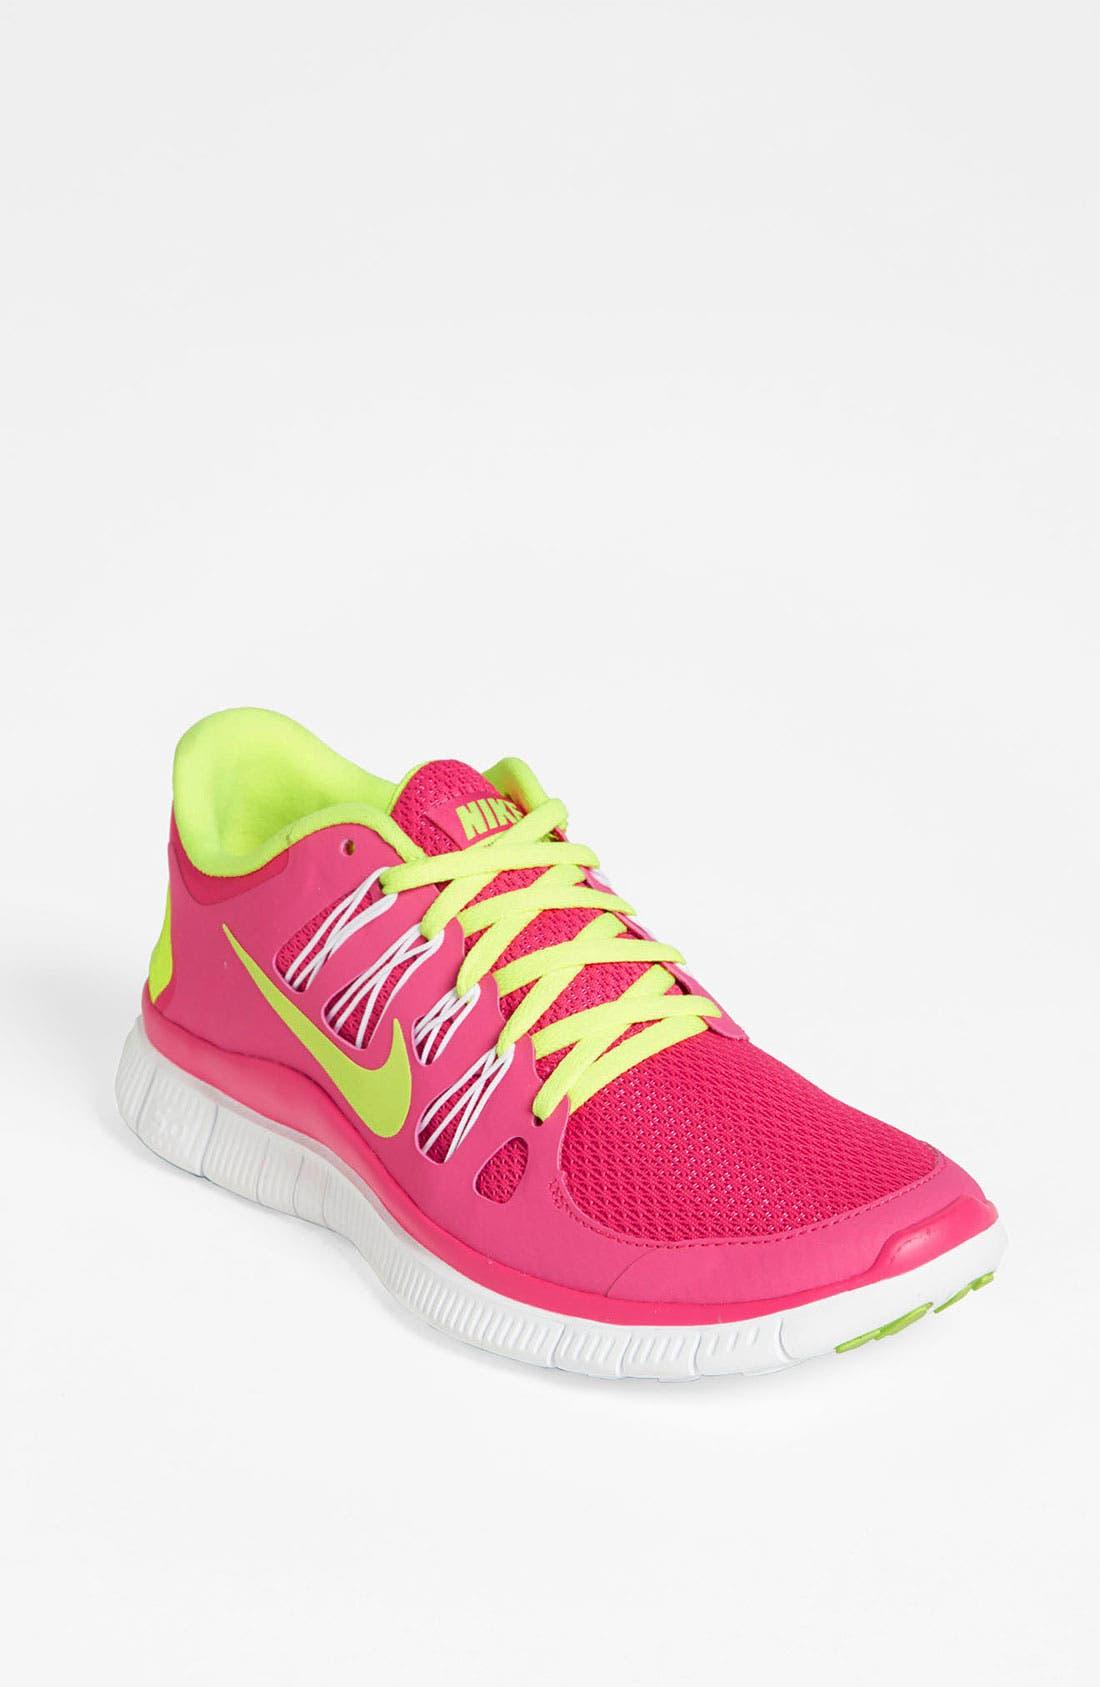 Main Image - Nike 'Free 5.0' Running Shoe (Women)